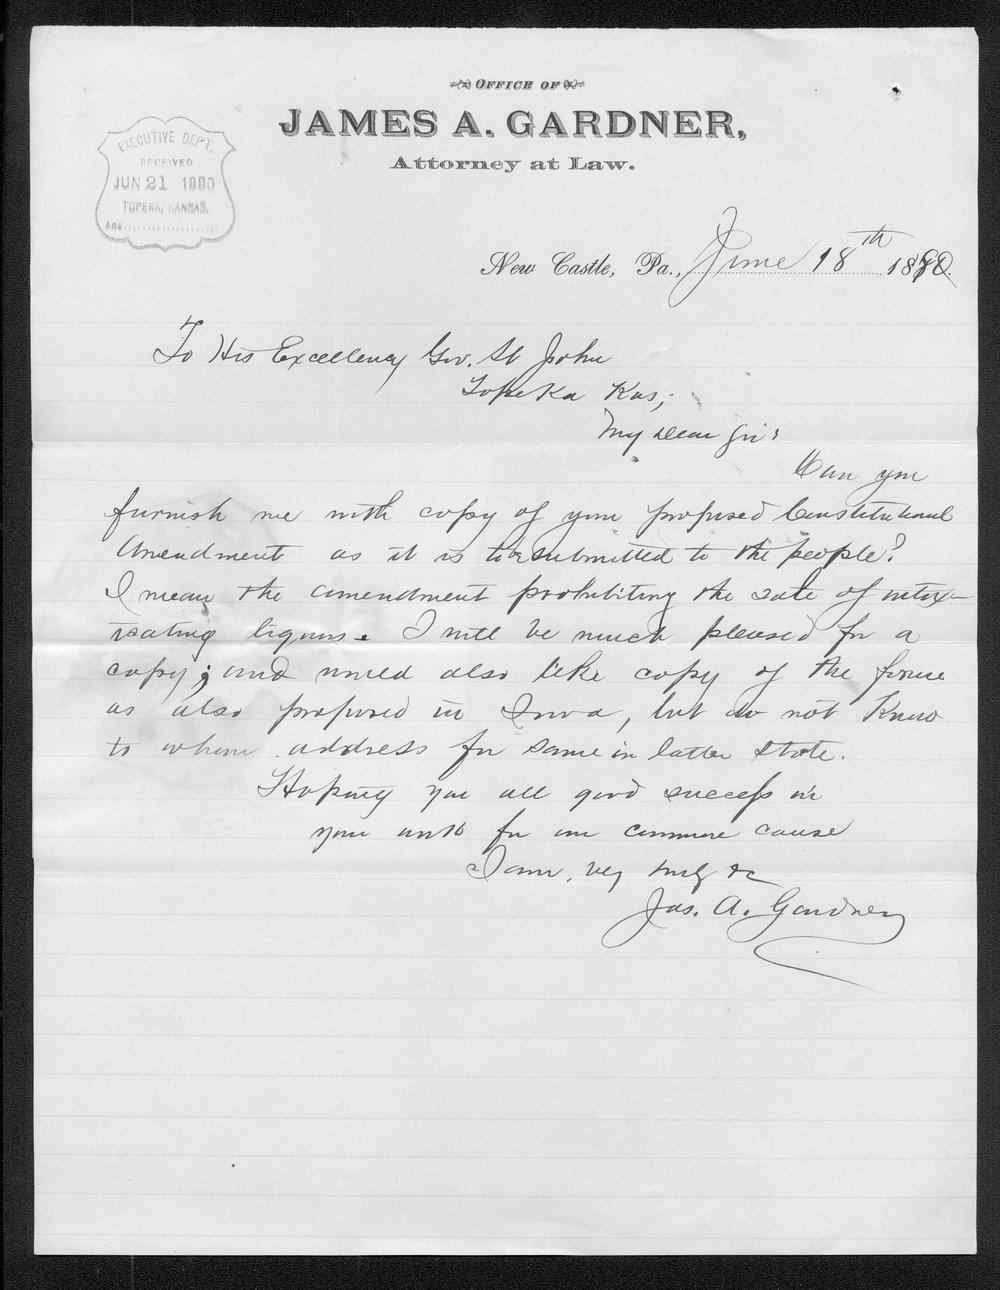 James A. Gardner to Governor John St. John